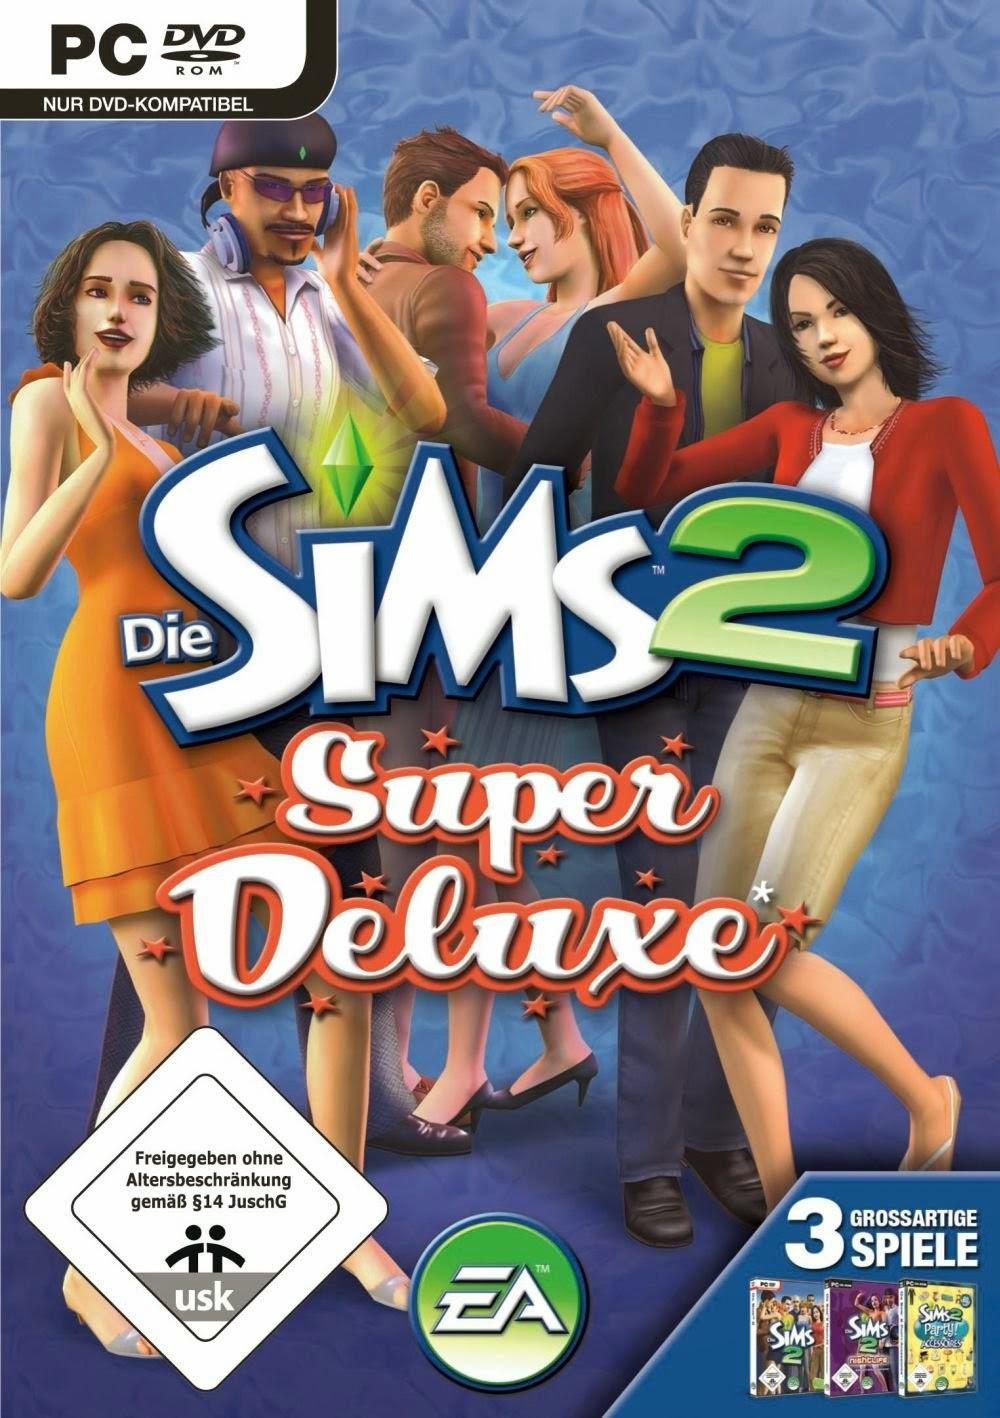 http://www.amazon.de/Die-Sims-2-Super-Deluxe/dp/B001542LC0/ref=sr_1_2?ie=UTF8&s=videogames&qid=1273068545&sr=8-2